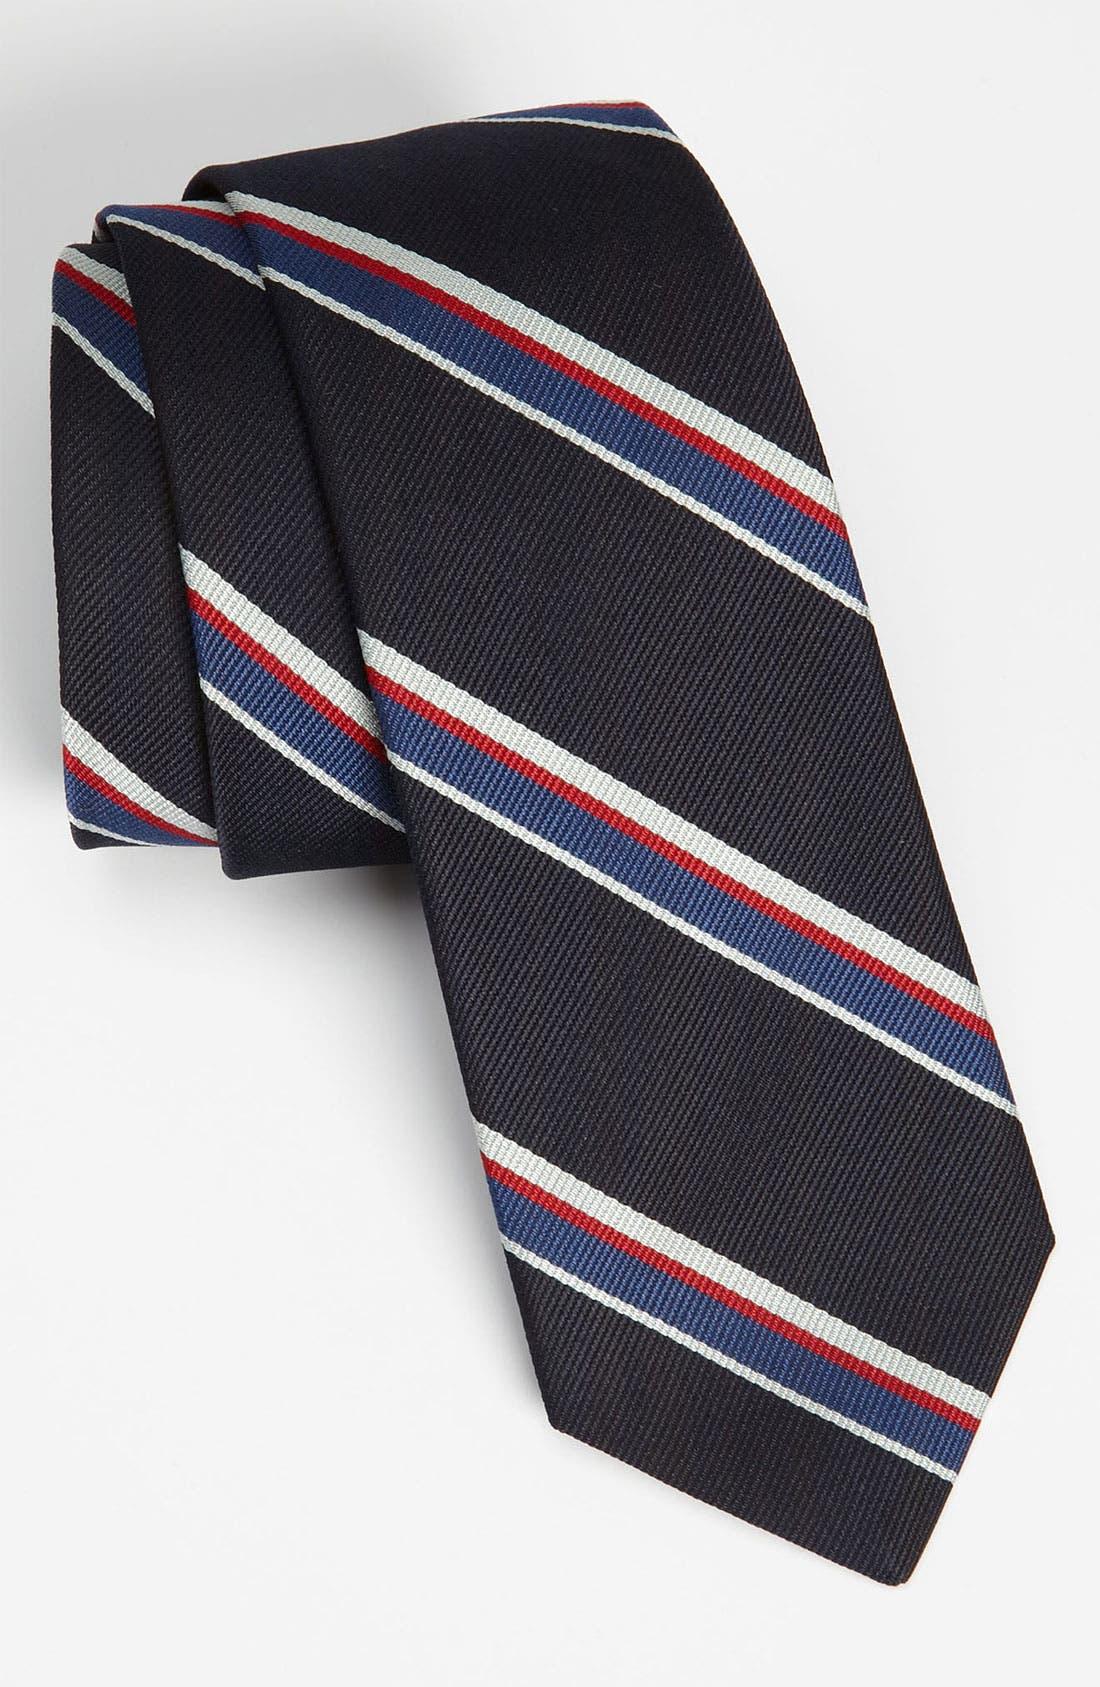 Alternate Image 1 Selected - Fahlgren Woven Tie